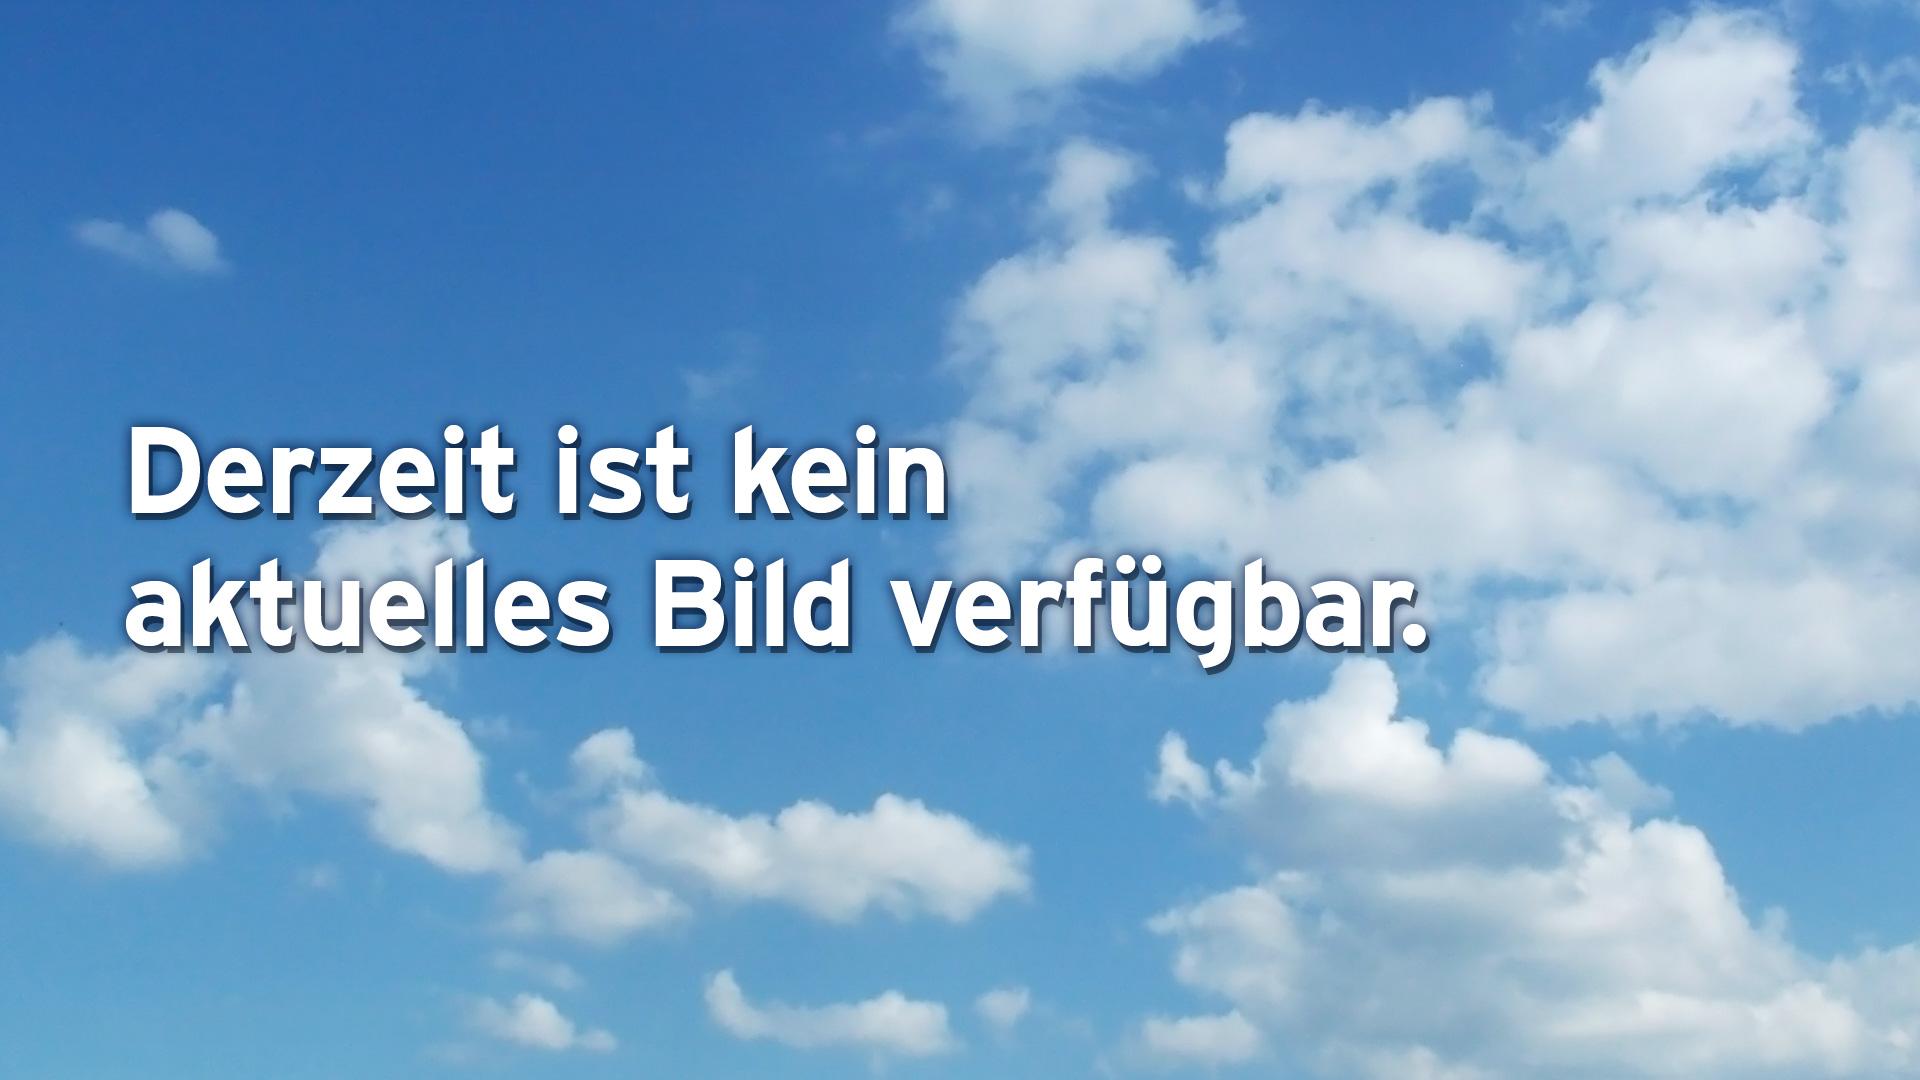 Zillertal, Zillertal 3000 - Tuxer Fernerhaus